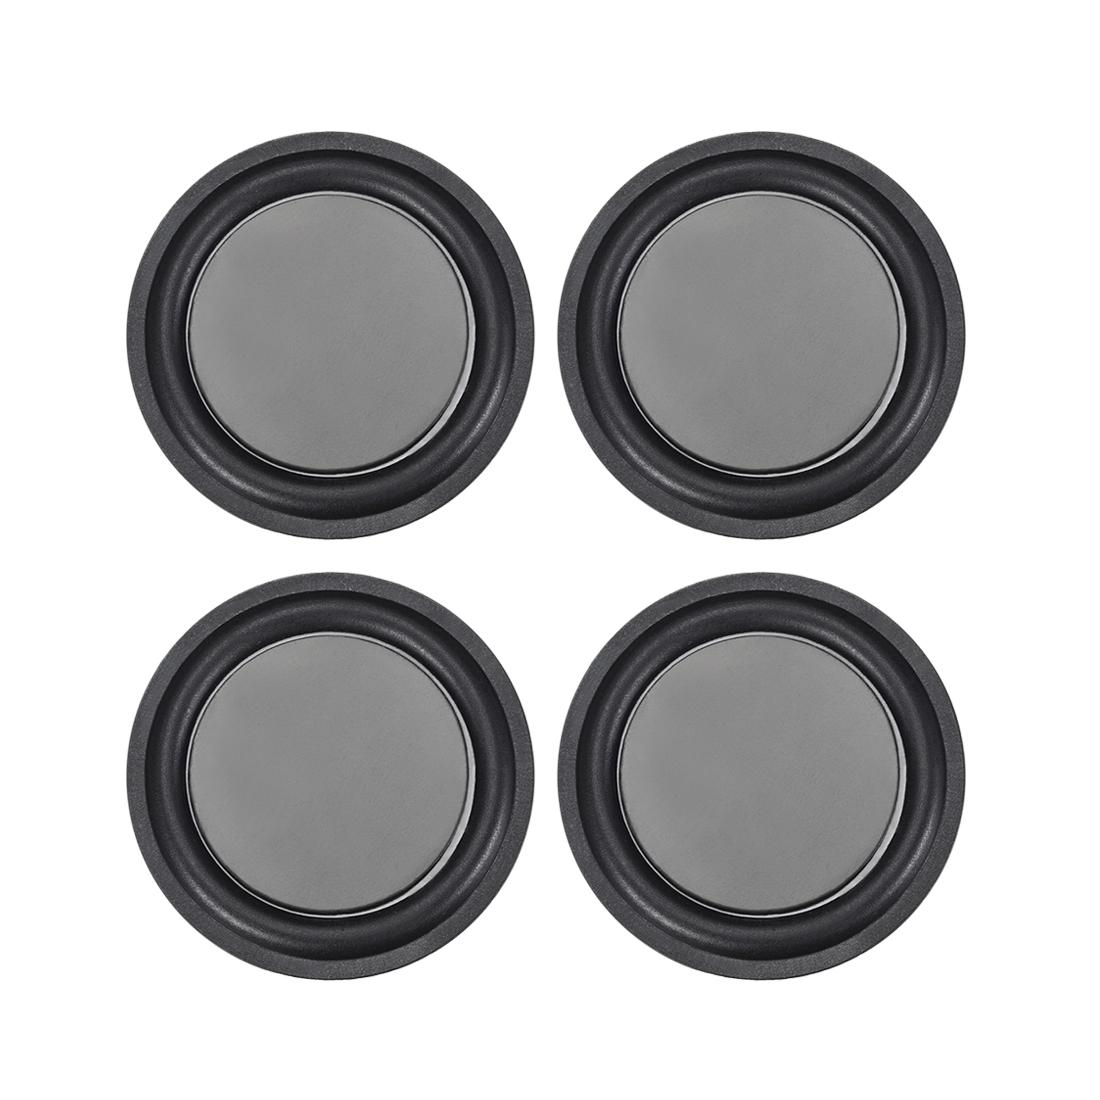 "4Pcs 2.5"" 67mm Bass Speaker Passive Radiator Rubber Vibration Plate DIY Repair"